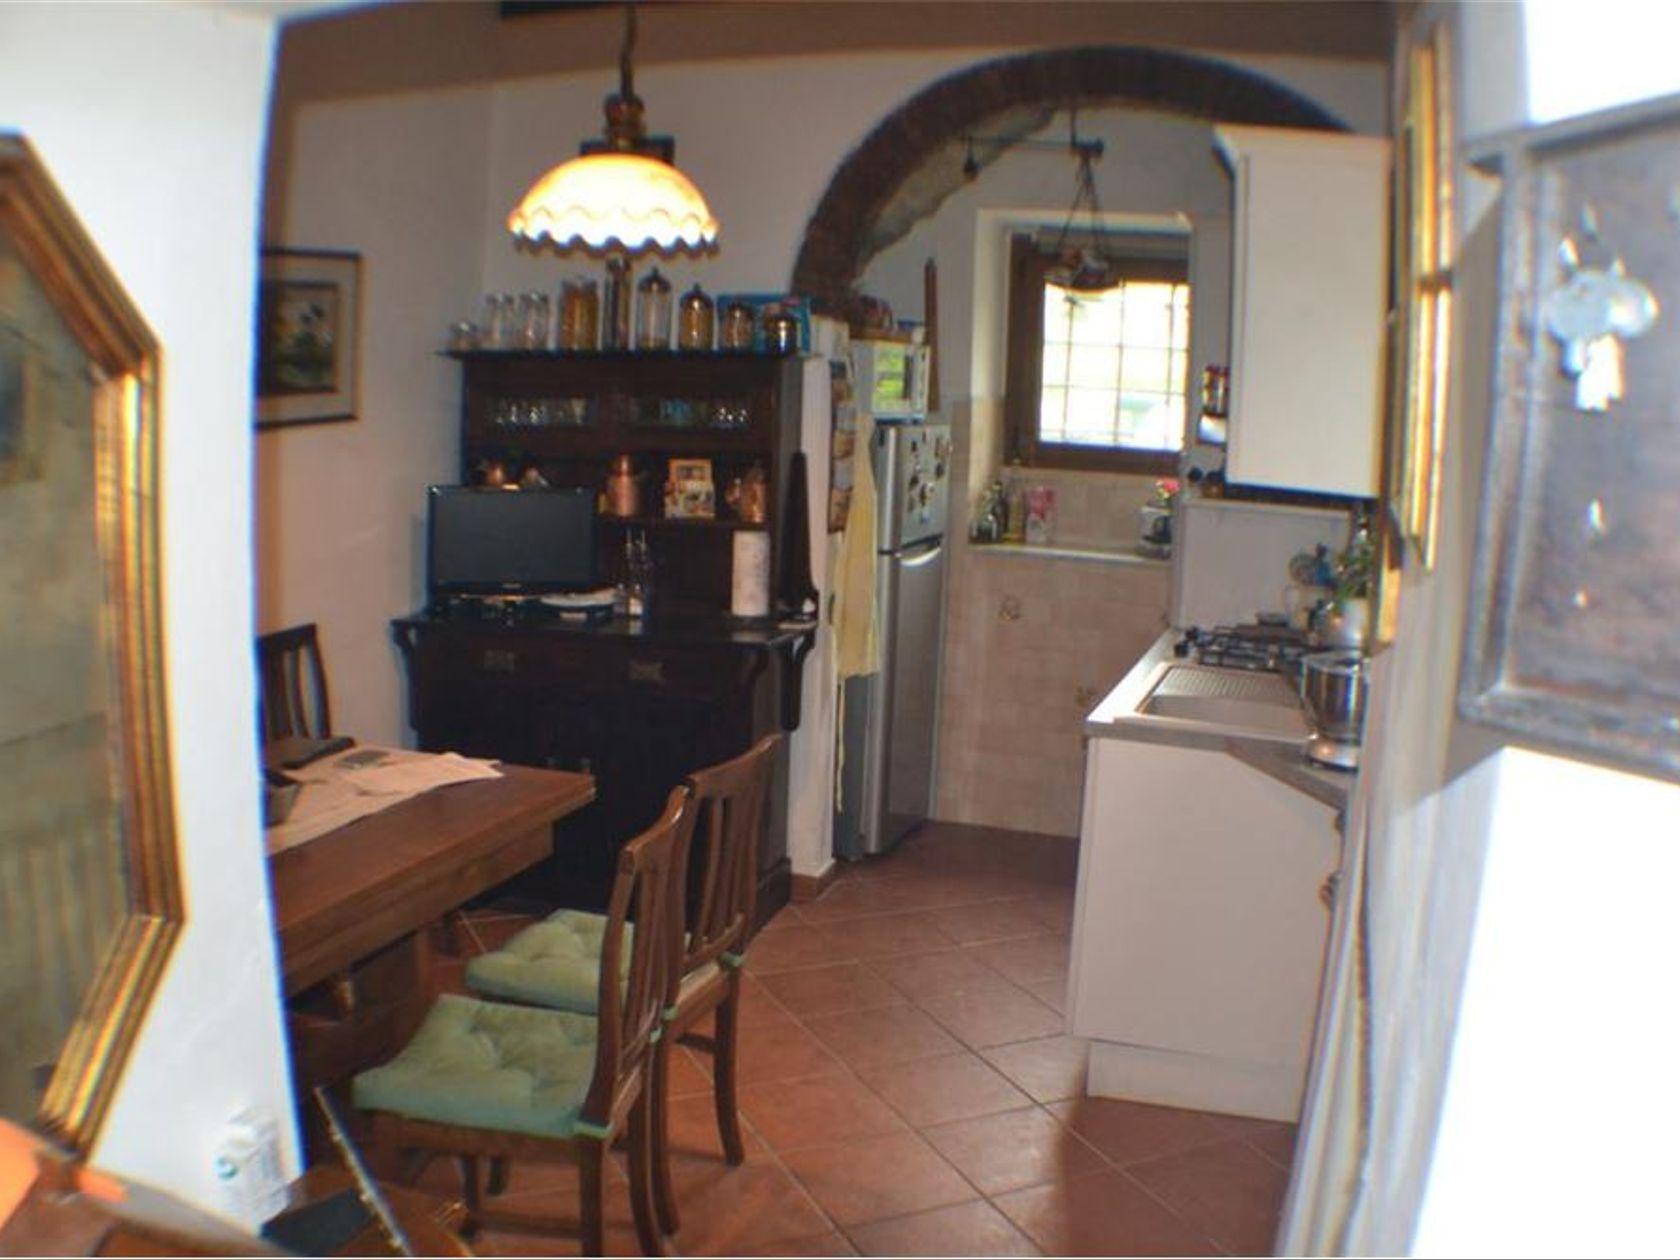 Appartamento Firenze - Firenze Sud Gavinana Europa, Firenze, FI Vendita - Foto 12